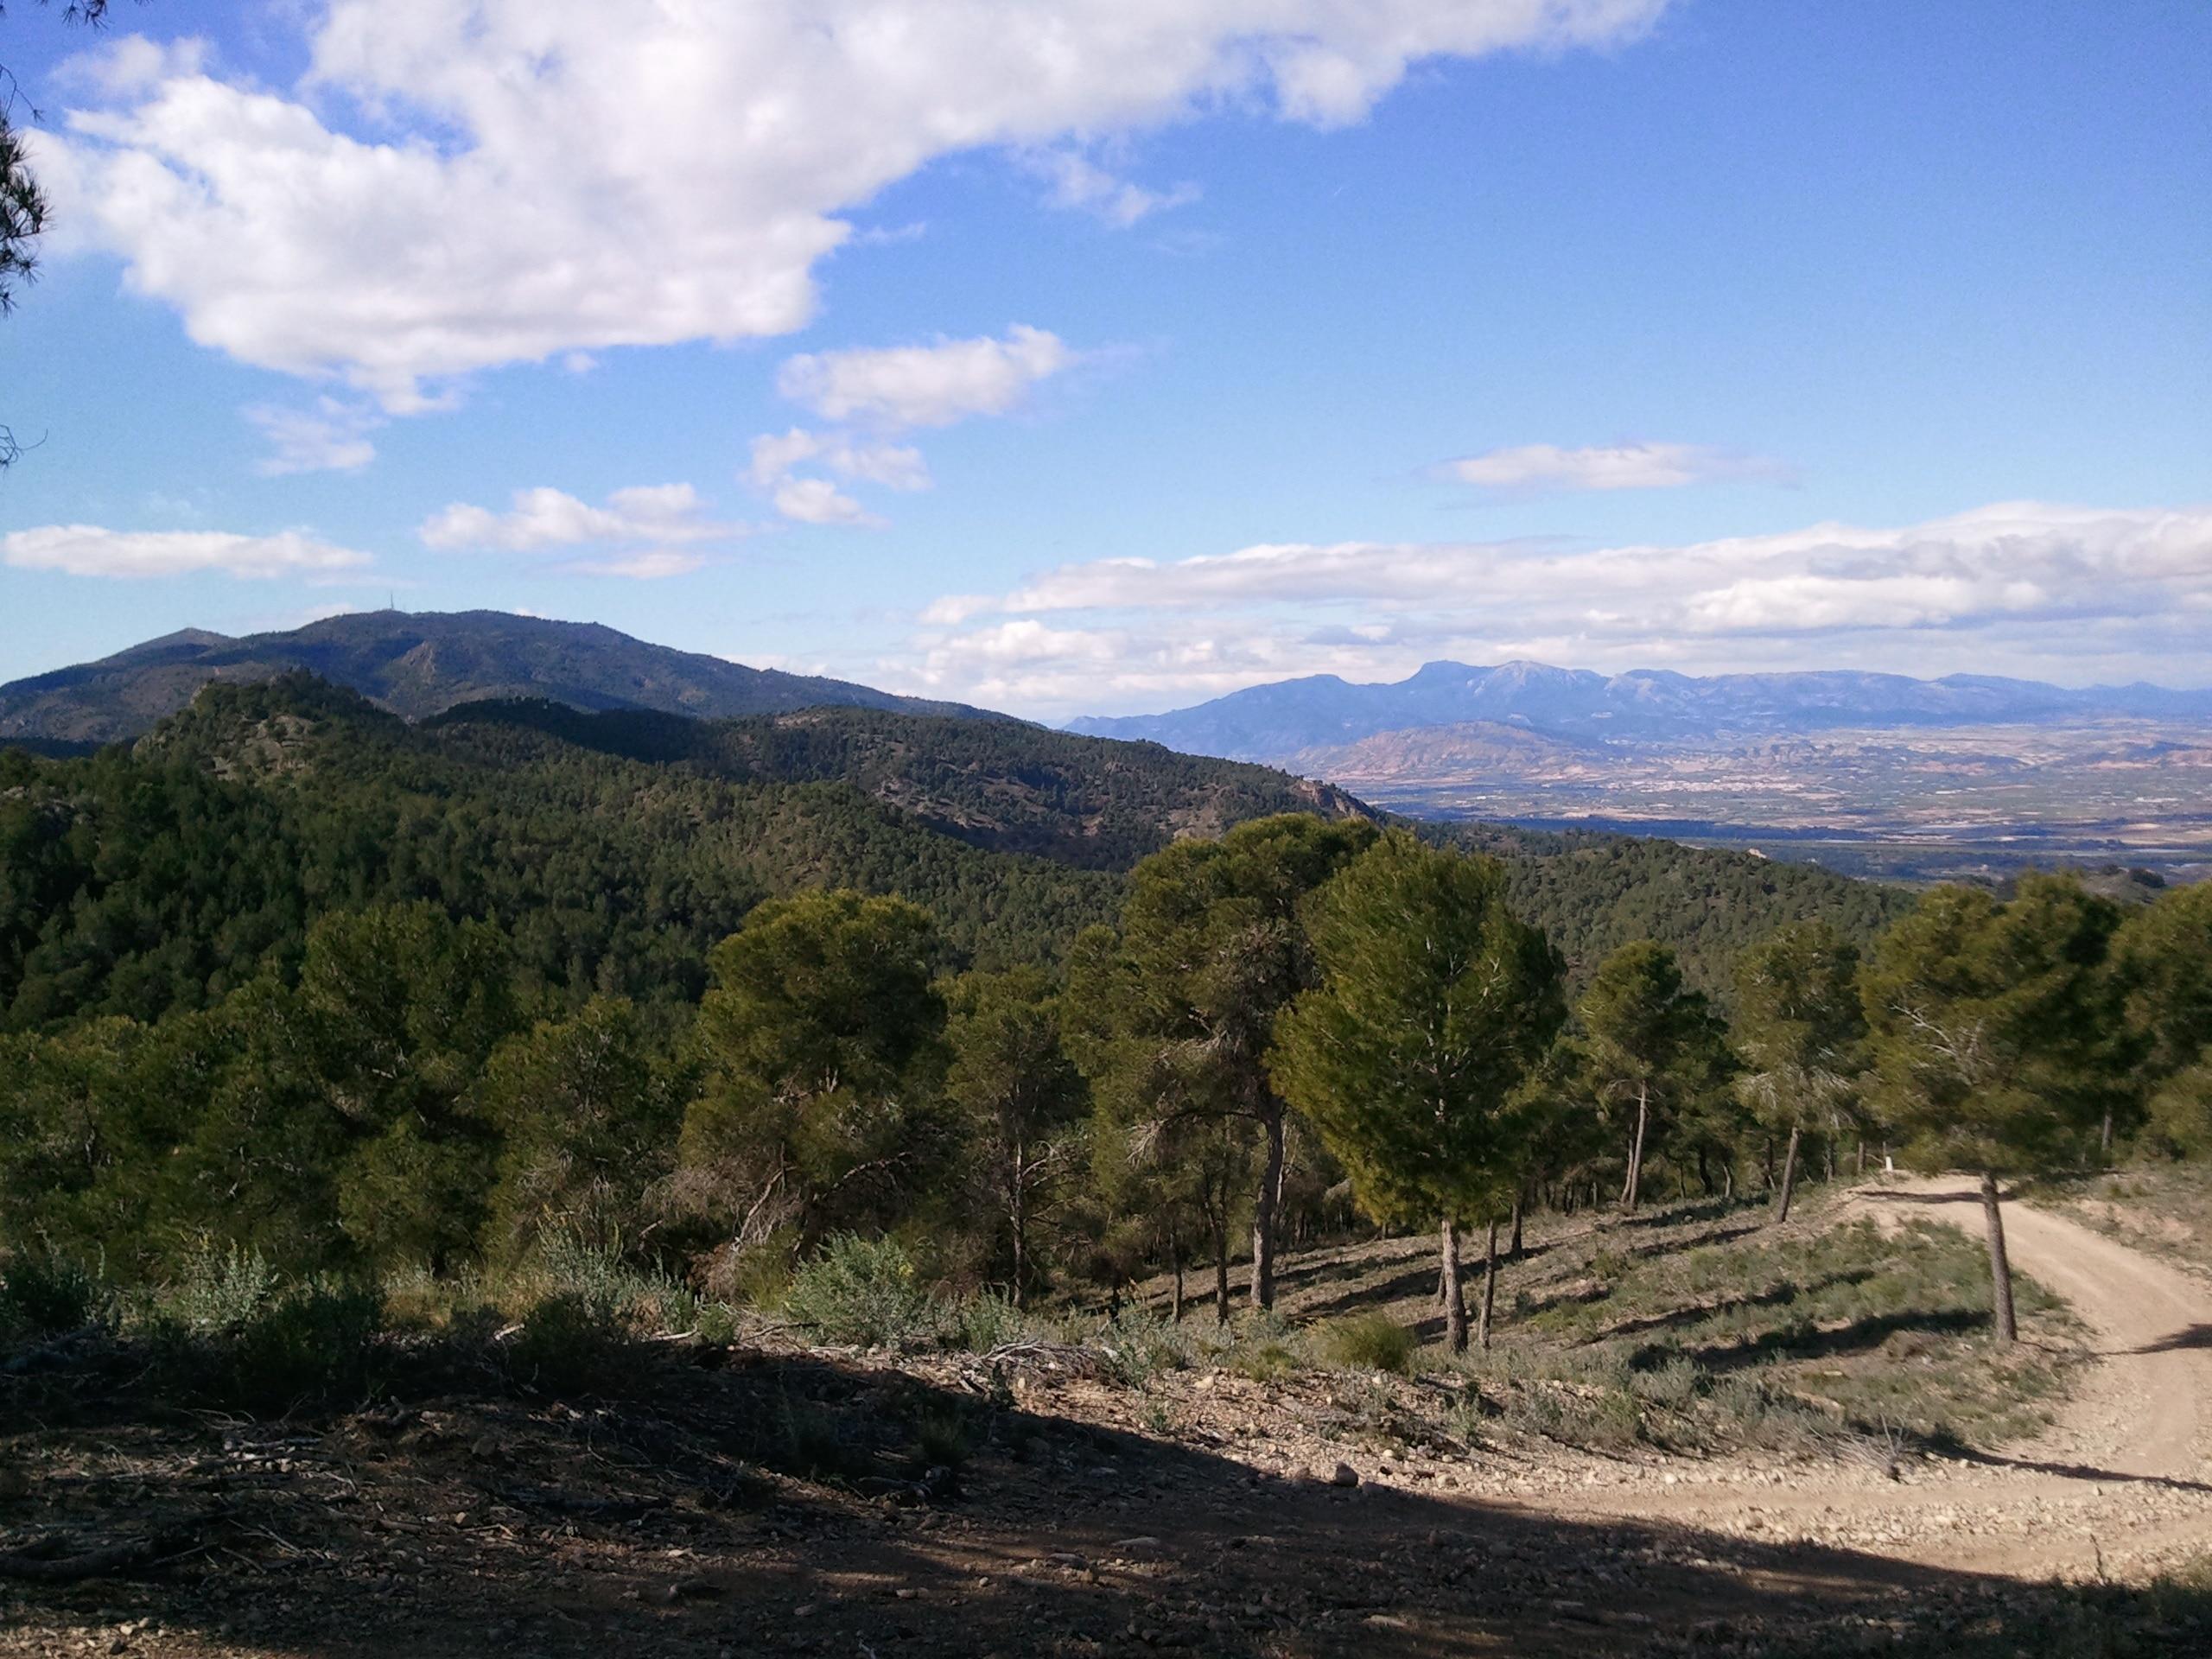 Corvera, Murcia, Murcia, Spain